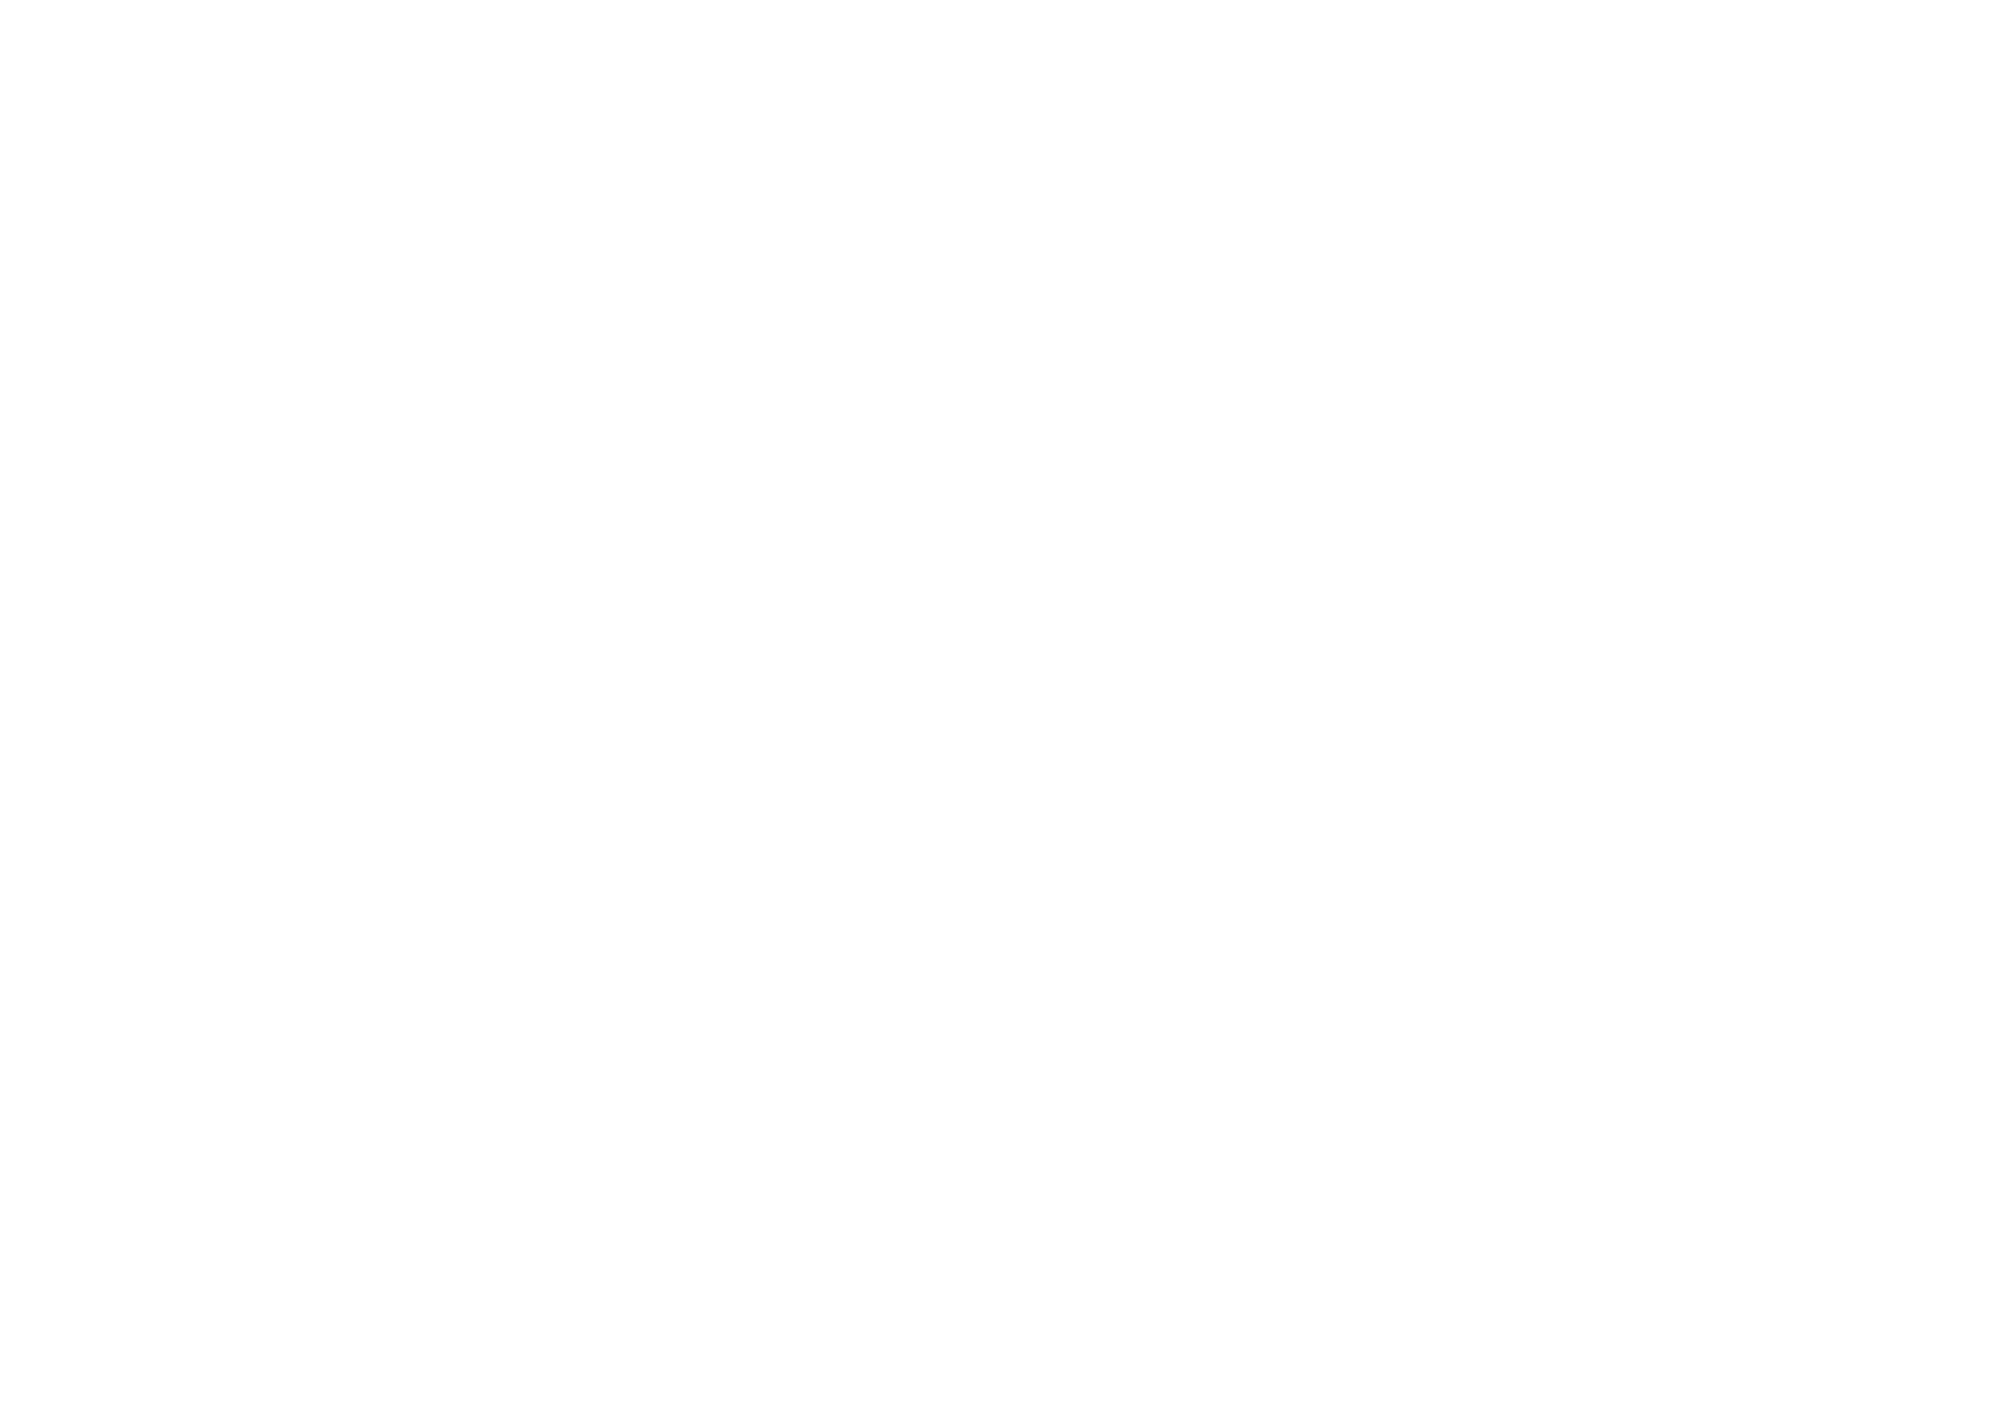 AuthclicK